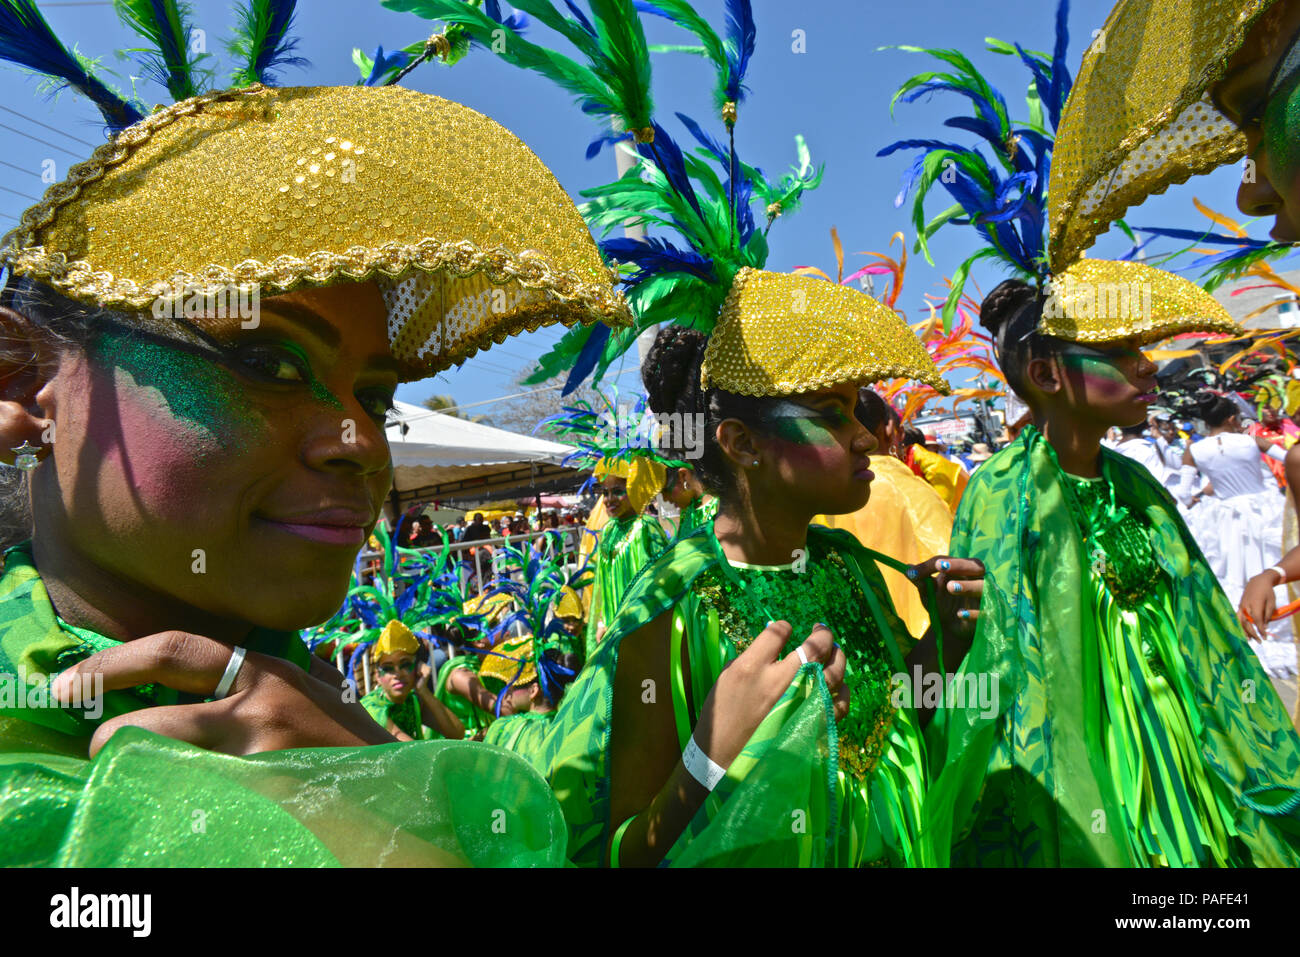 Ritmo del pajarito (bird's rythm). La batalla de flores, el Carnaval de Barranquilla. Foto de stock